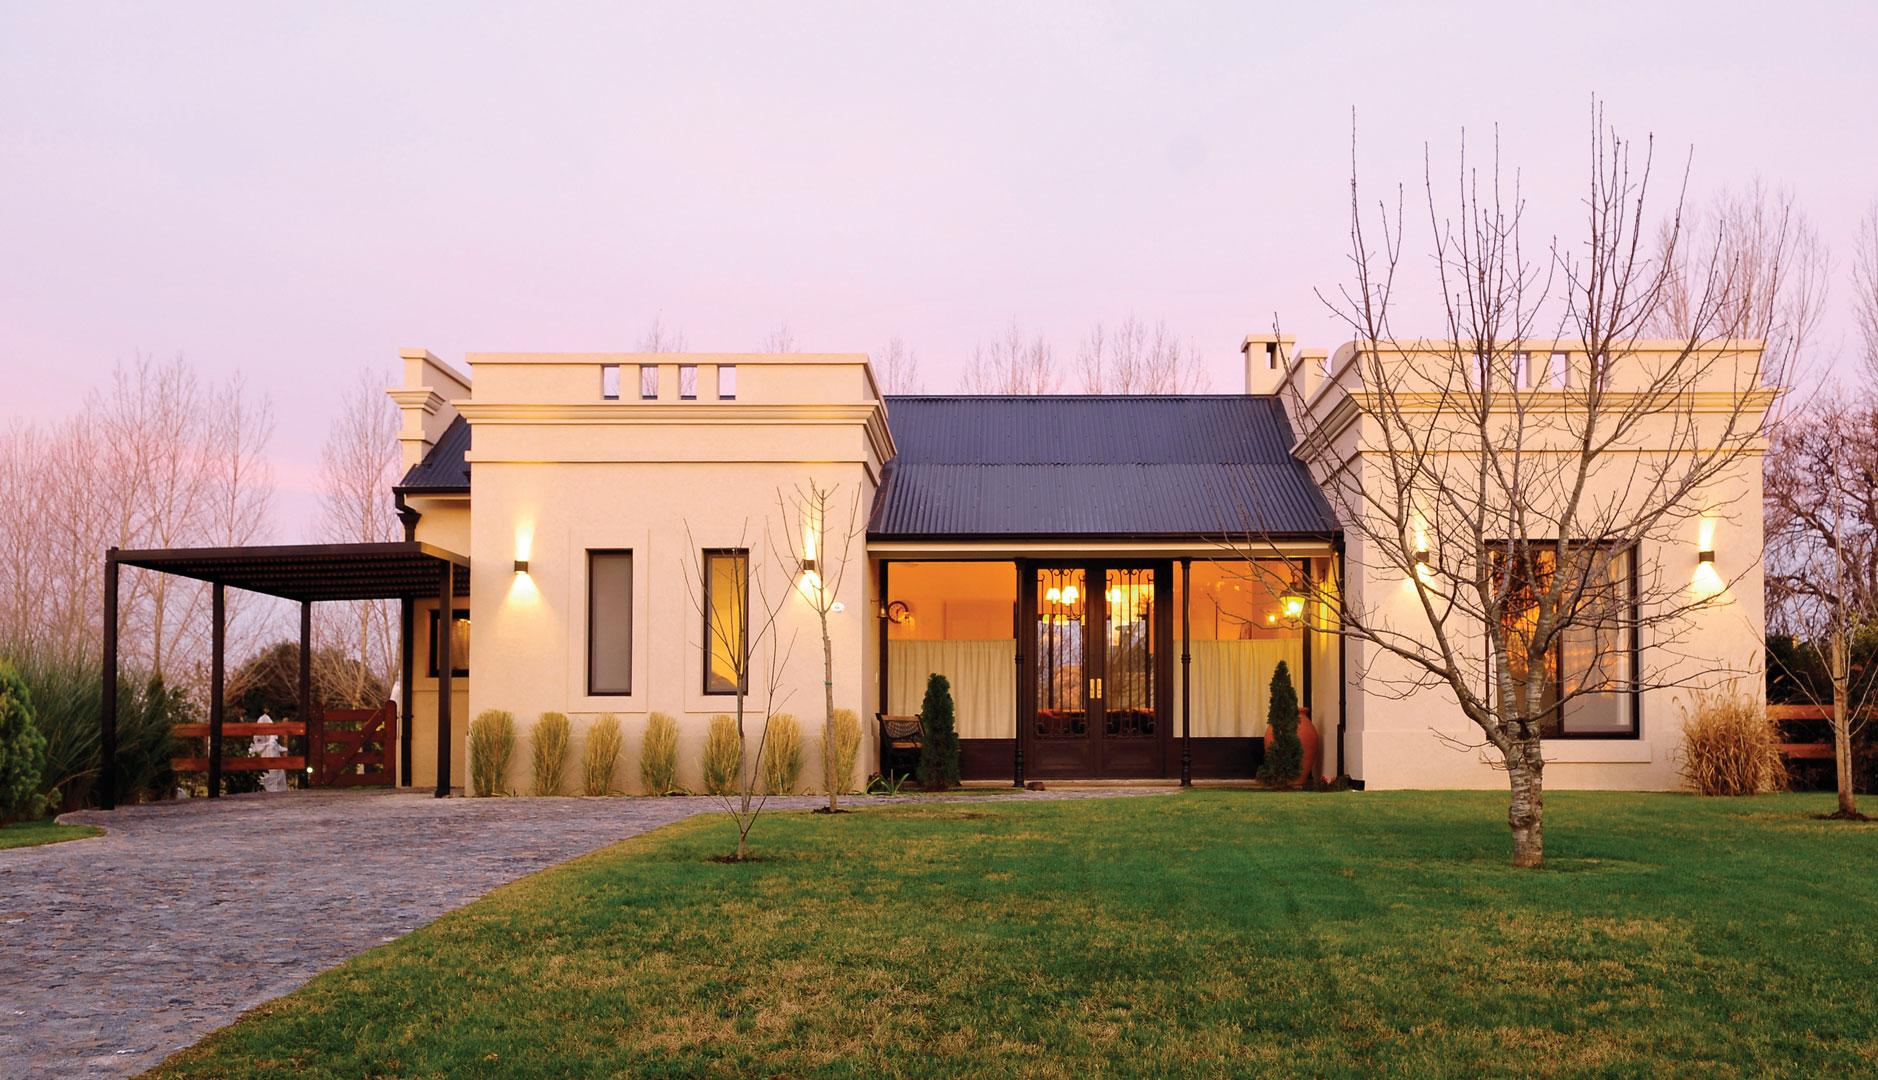 Marcela parrado arquitectura casa estilo cl sico campo argentino arquitecto portal de - Casas clasicas modernas ...